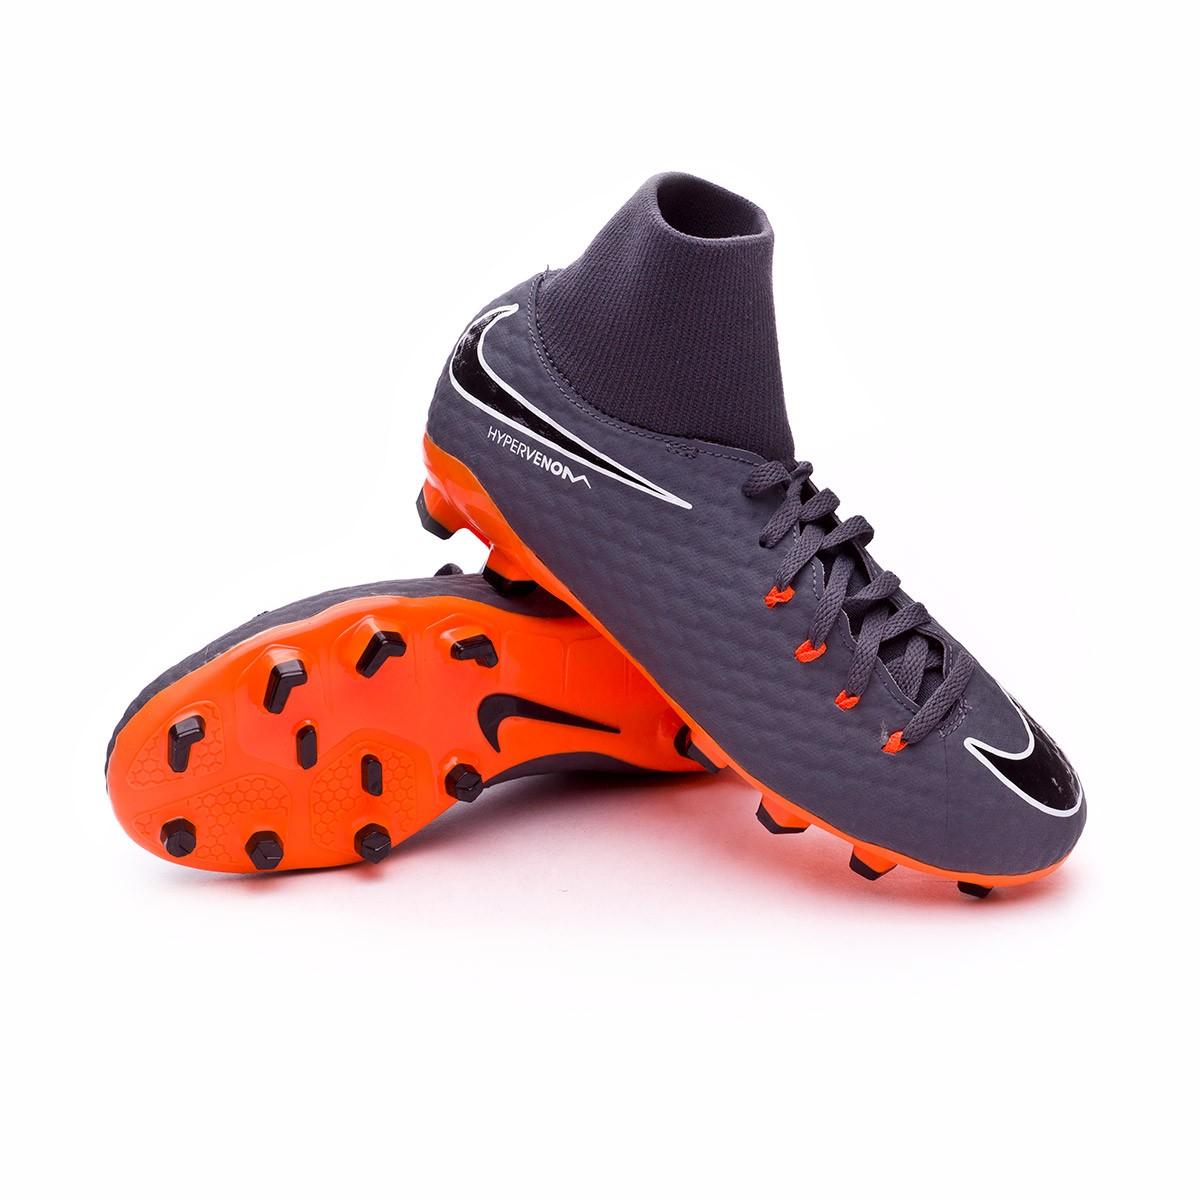 b408f0260 Football Boots Nike Kids Hypervenom Phantom III Academy DF FG Dark ...